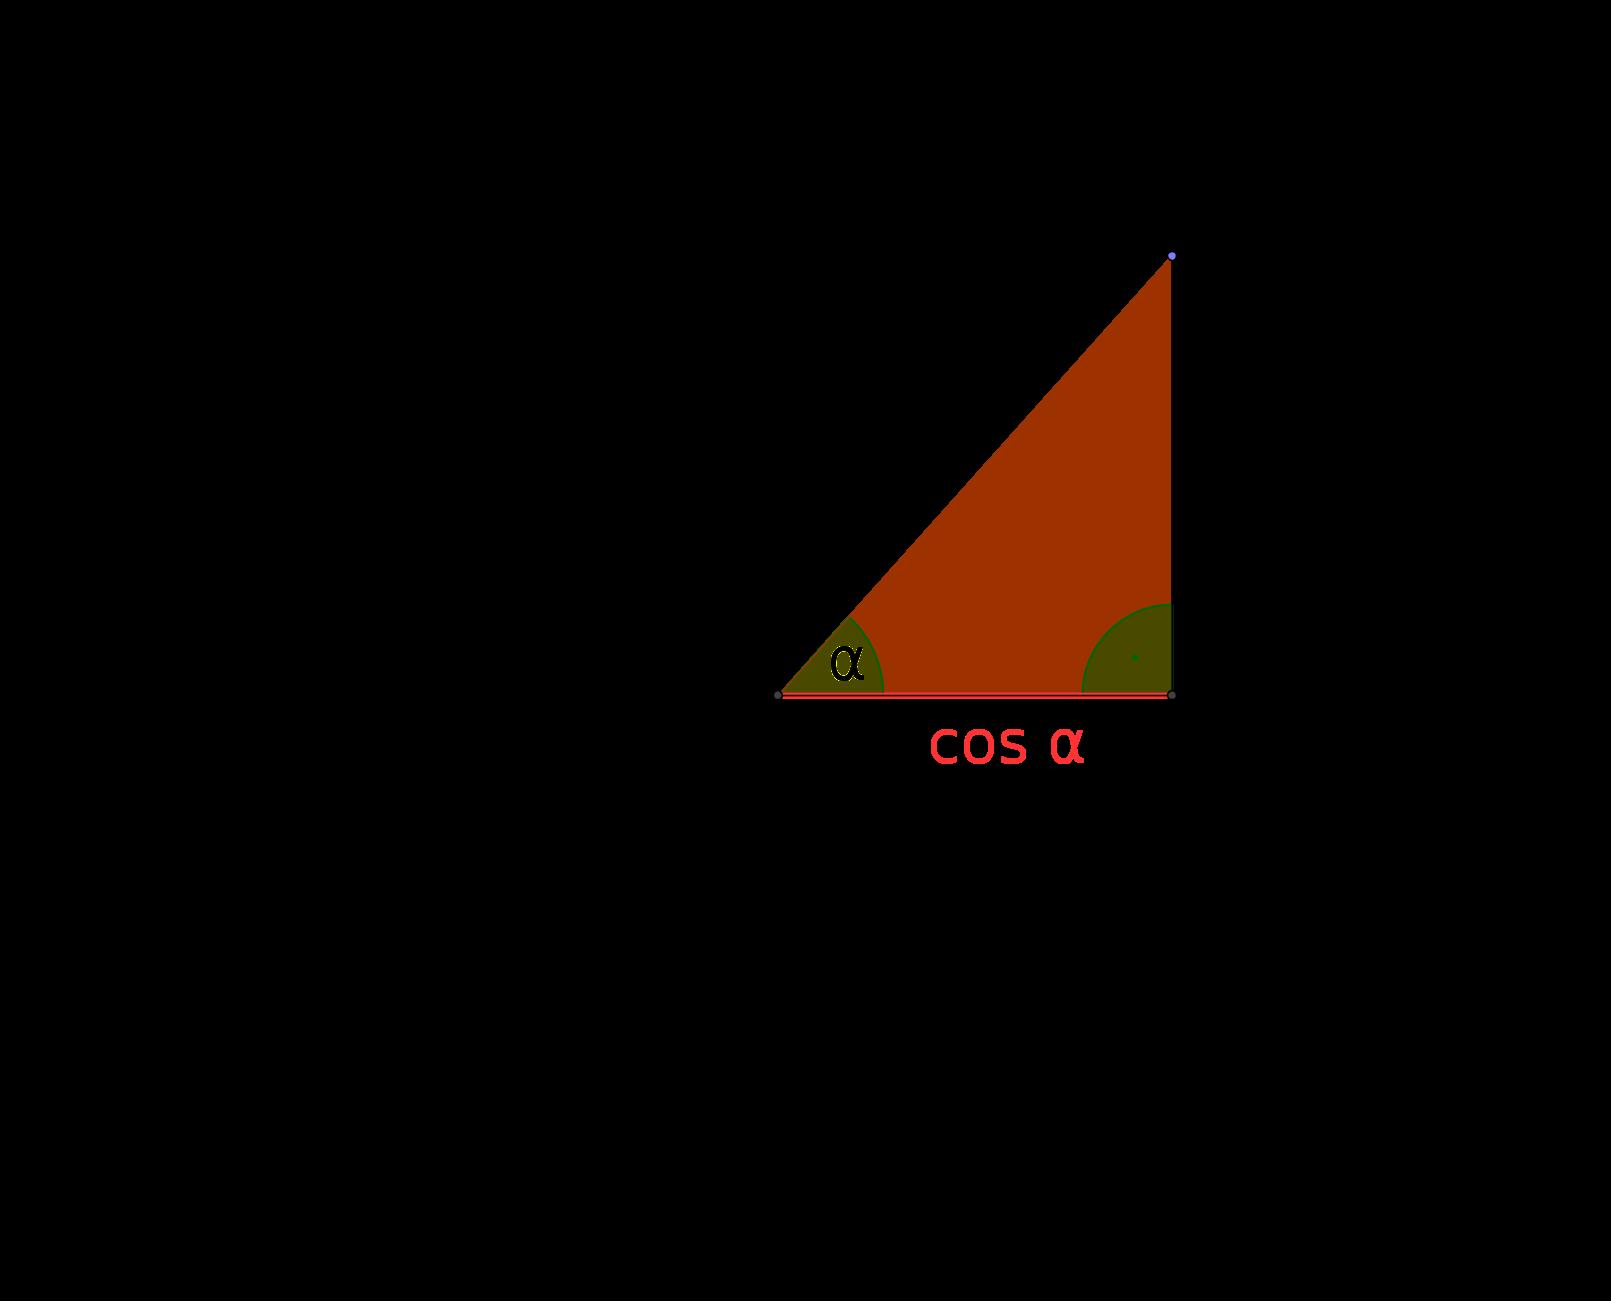 Onlinebrückenkurs Mathematik Abschnitt 6.5.3 Kosinus und Tangens